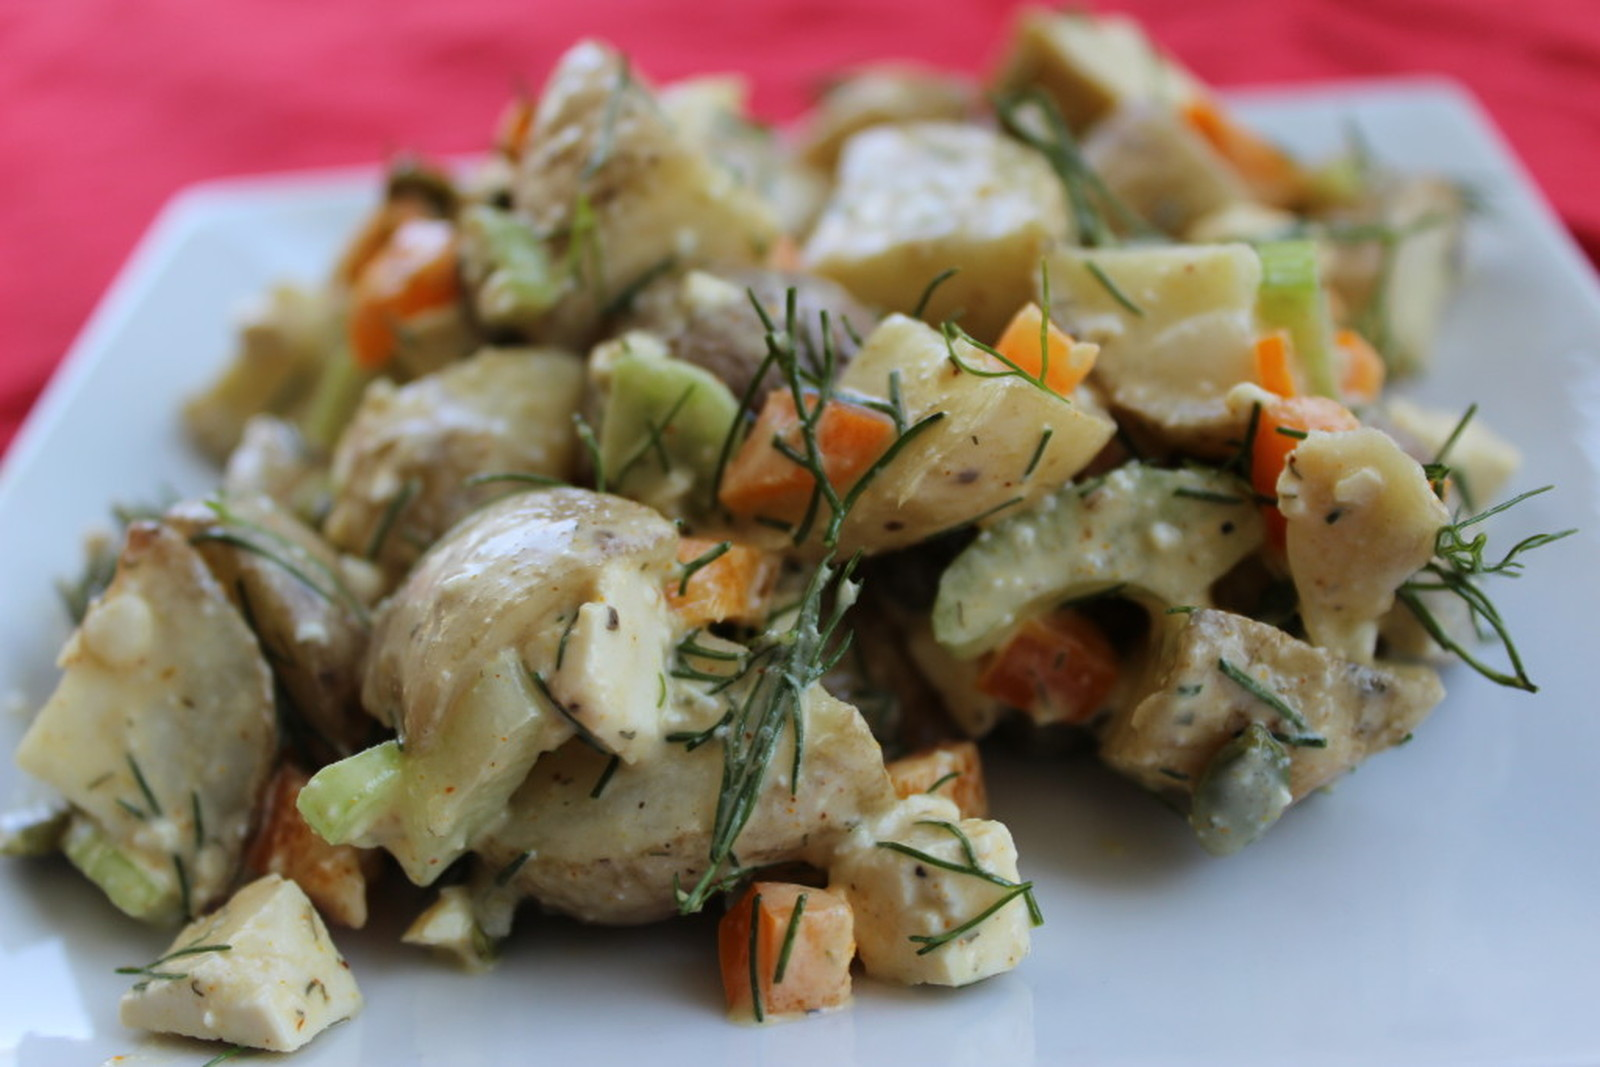 Potluck Potato Salad [Vegan, Gluten-Free]